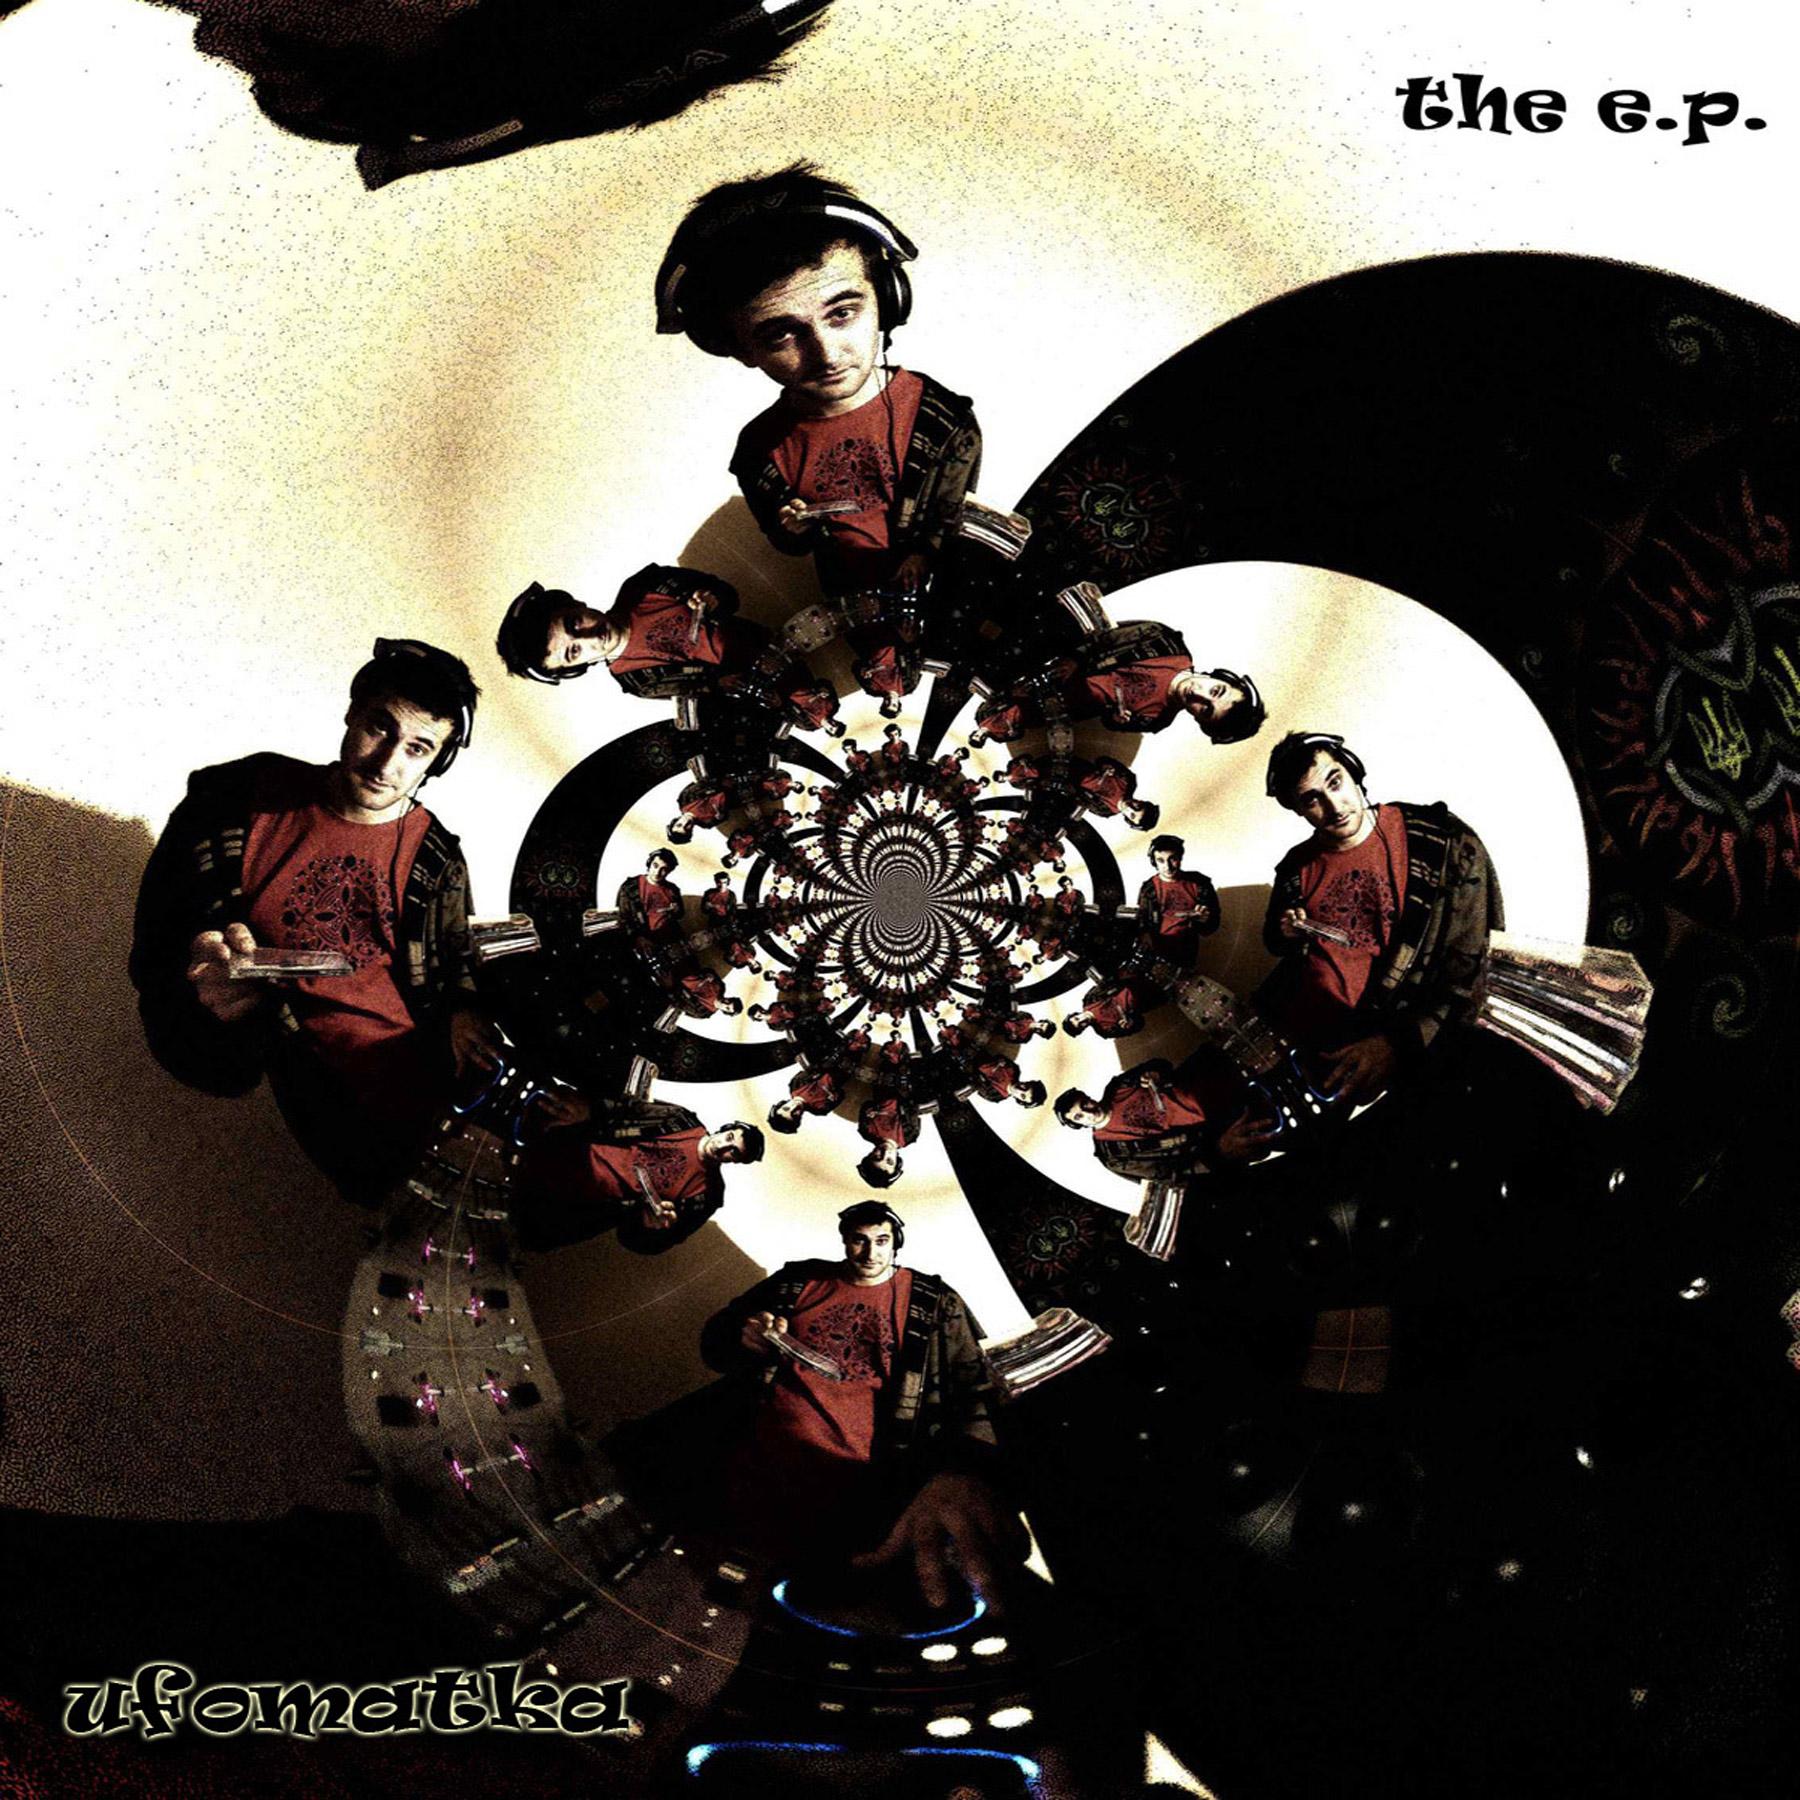 Ufomatka «The E.P.» EP